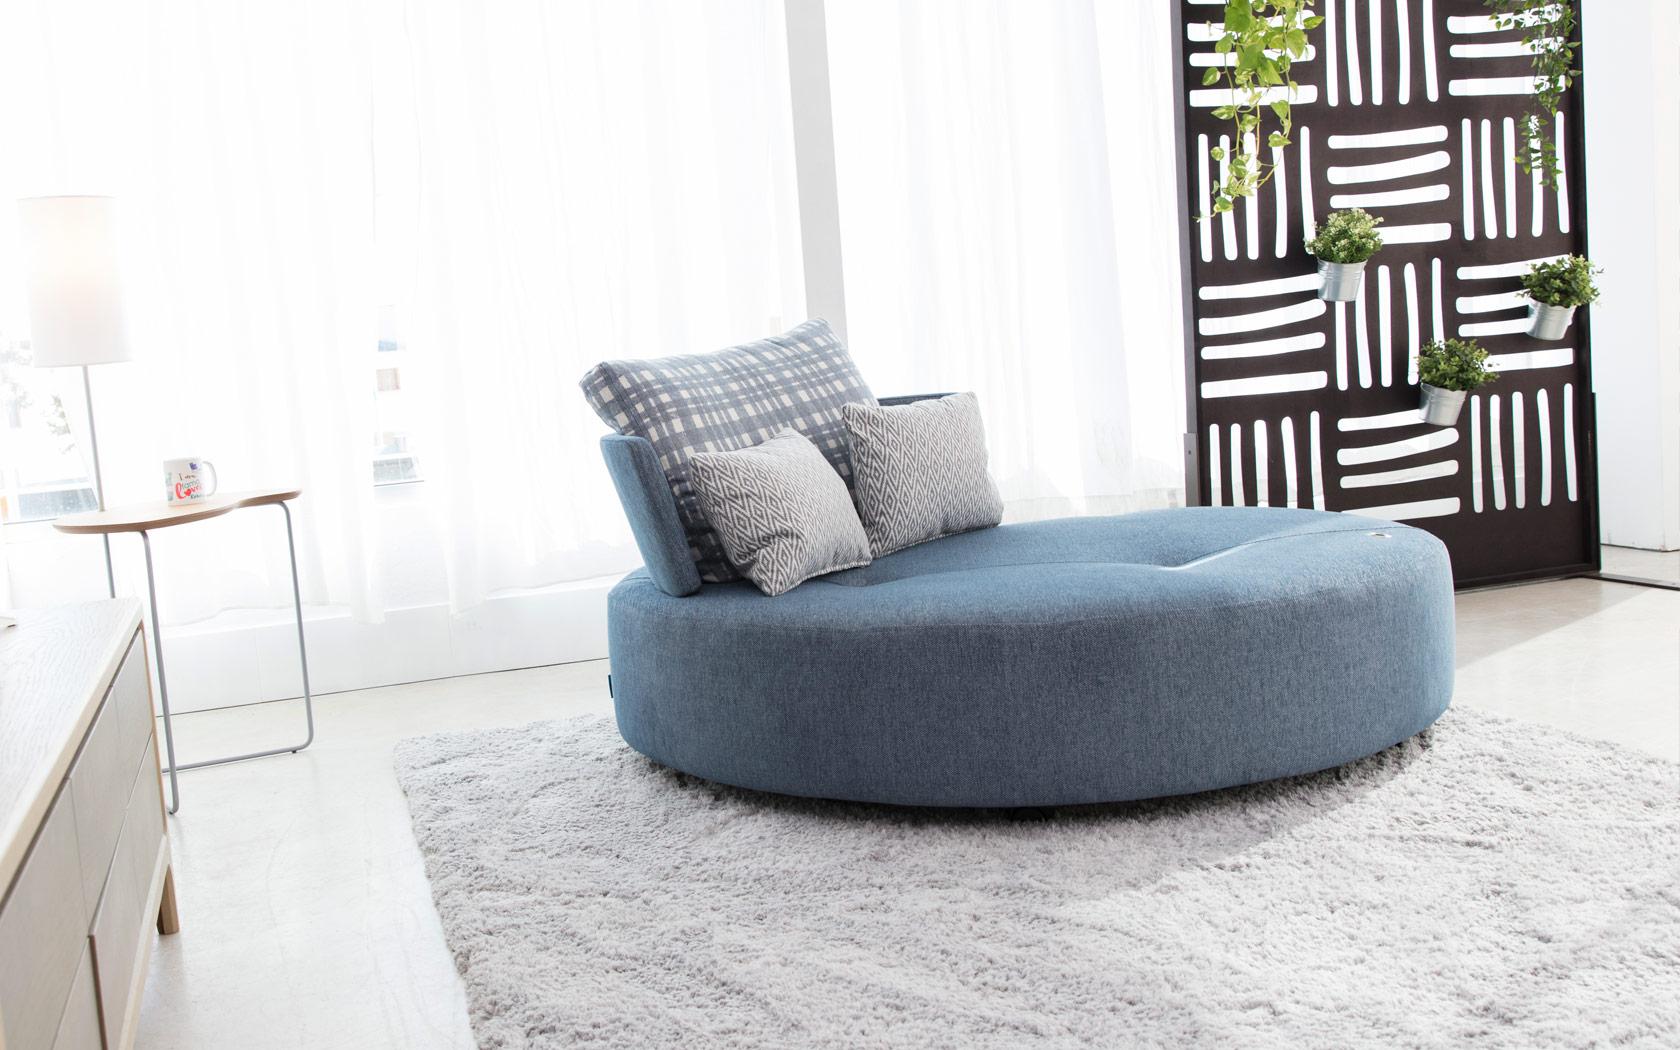 Mycuore sofa Fama 2020 05